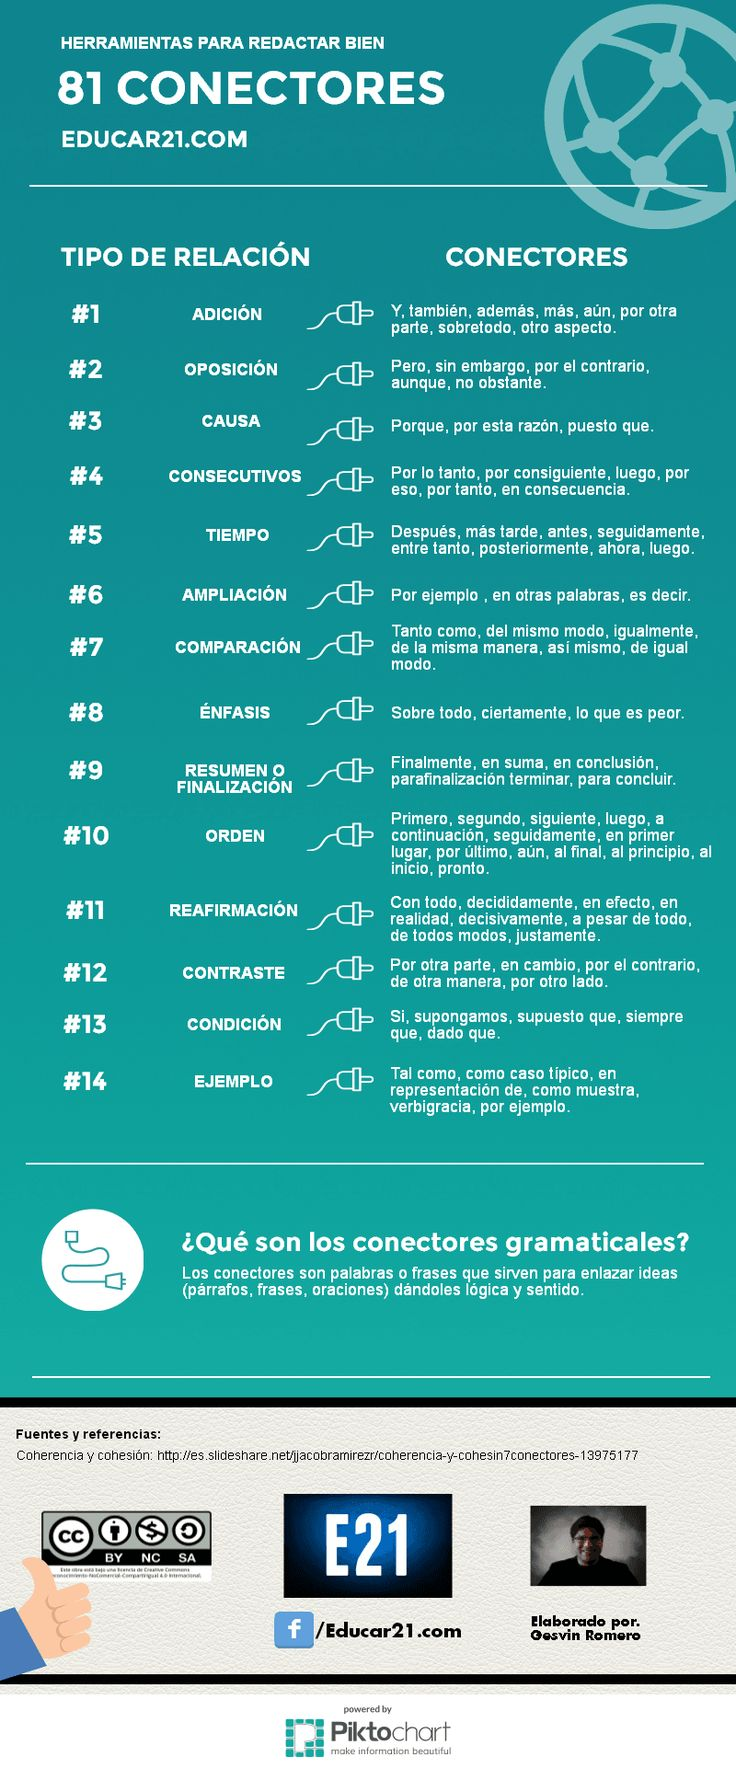 81 conectores gramaticales para redactar bien #infografia #infographic…